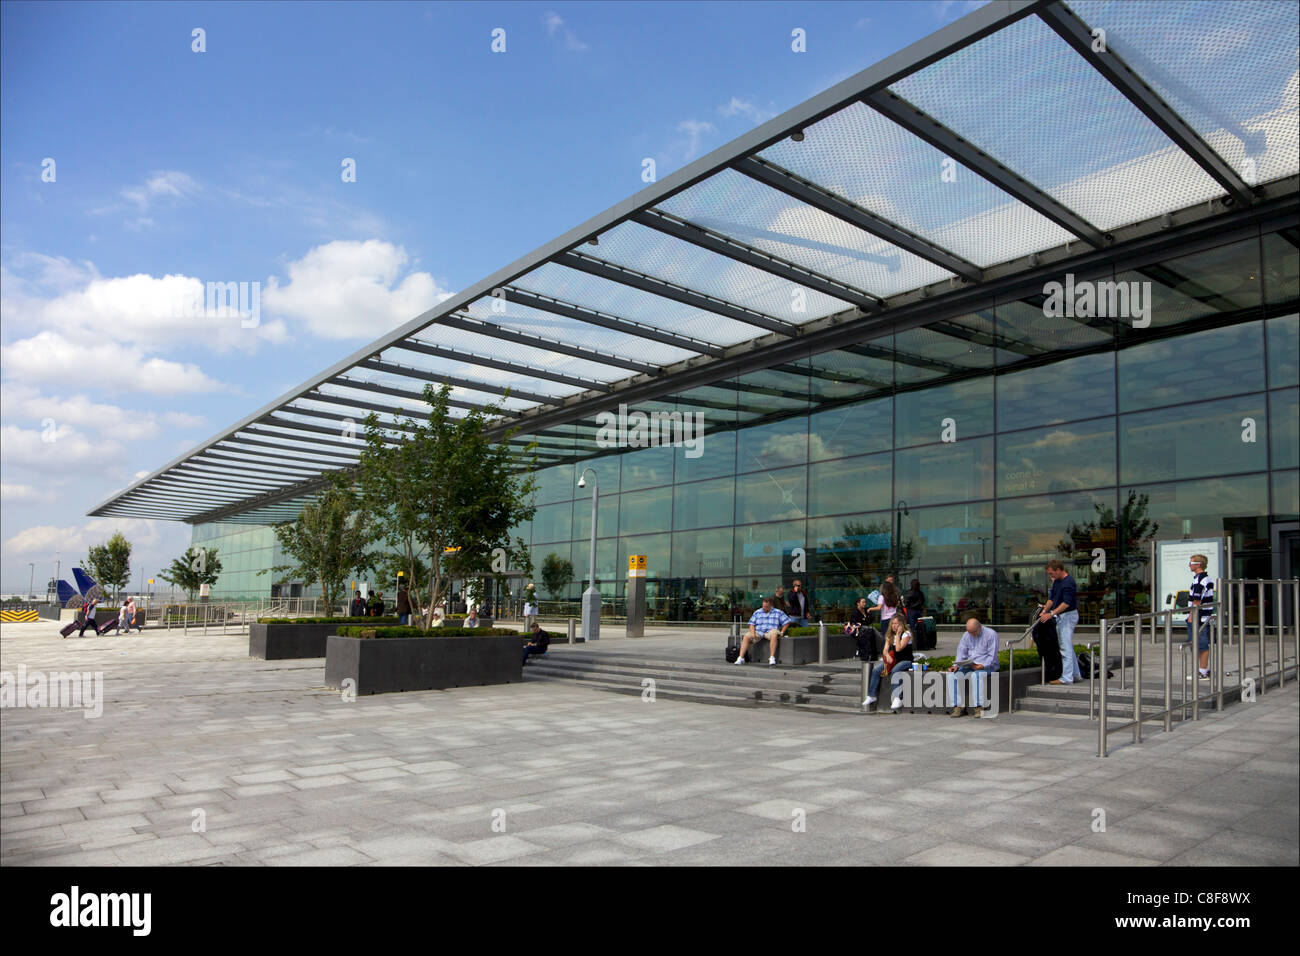 Passengers wait outside Terminal 4, Heathrow Airport, London, England, United Kingdom - Stock Image